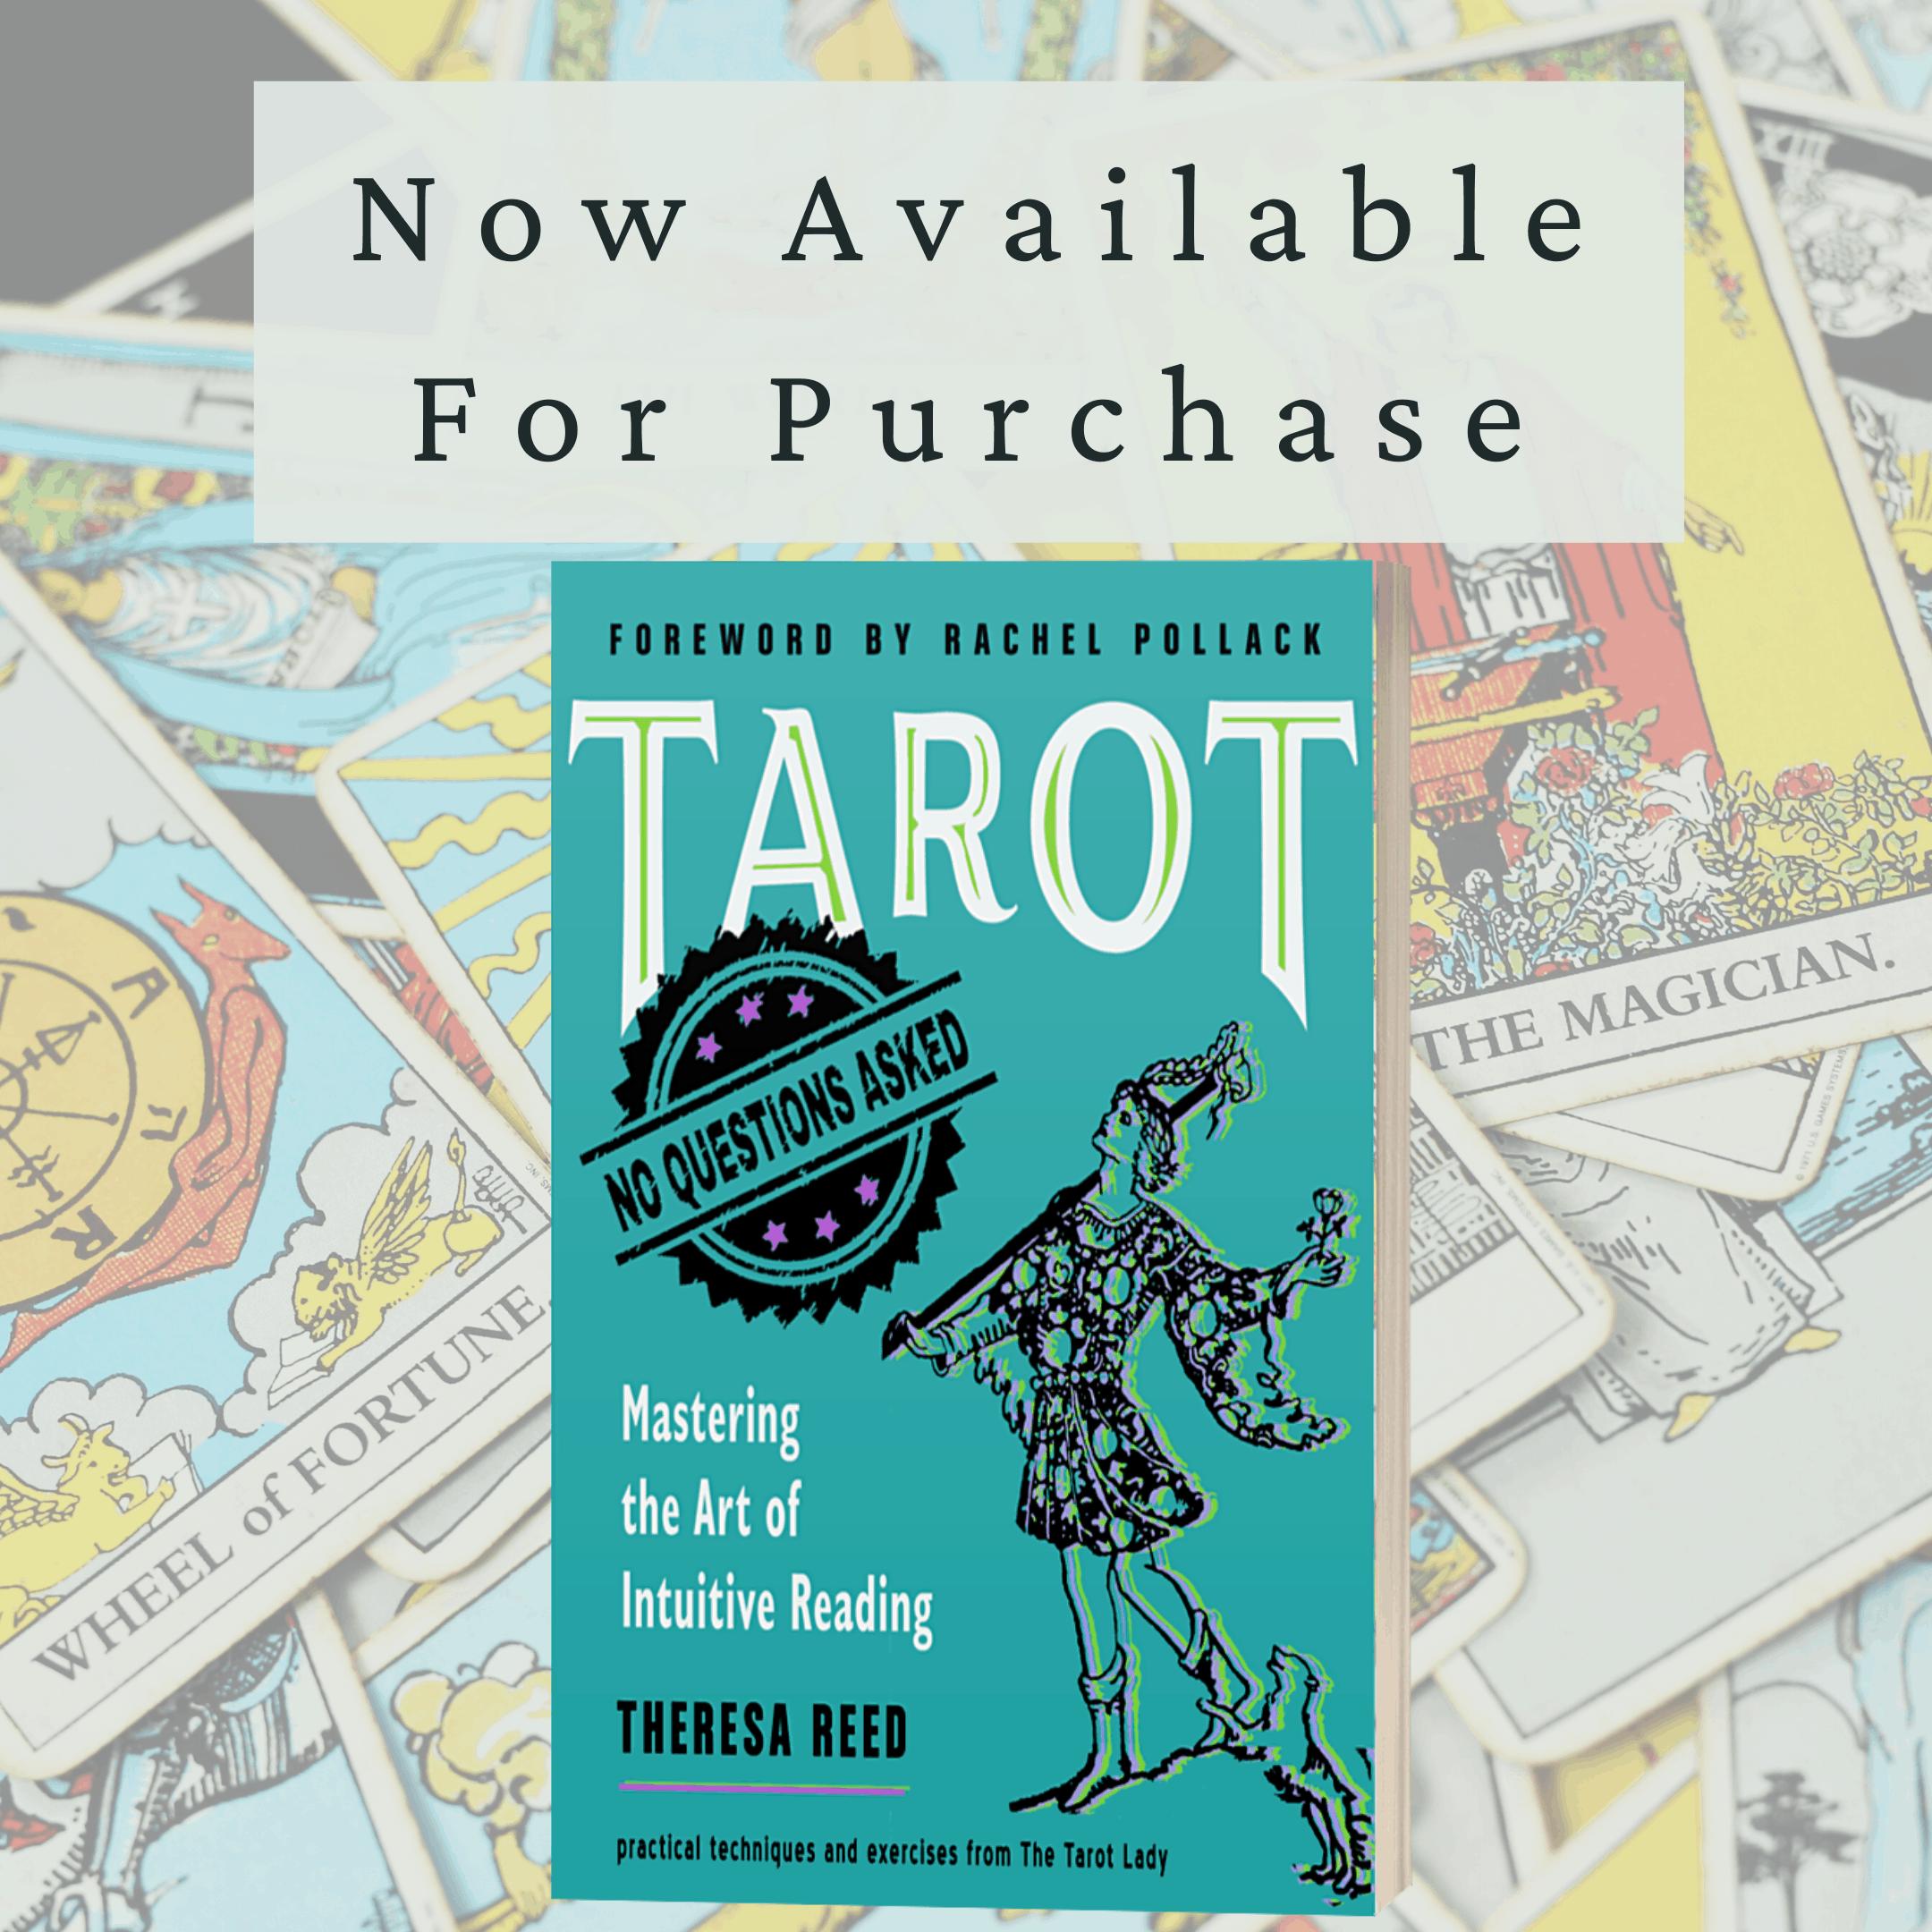 Tarot - No Questions Asked